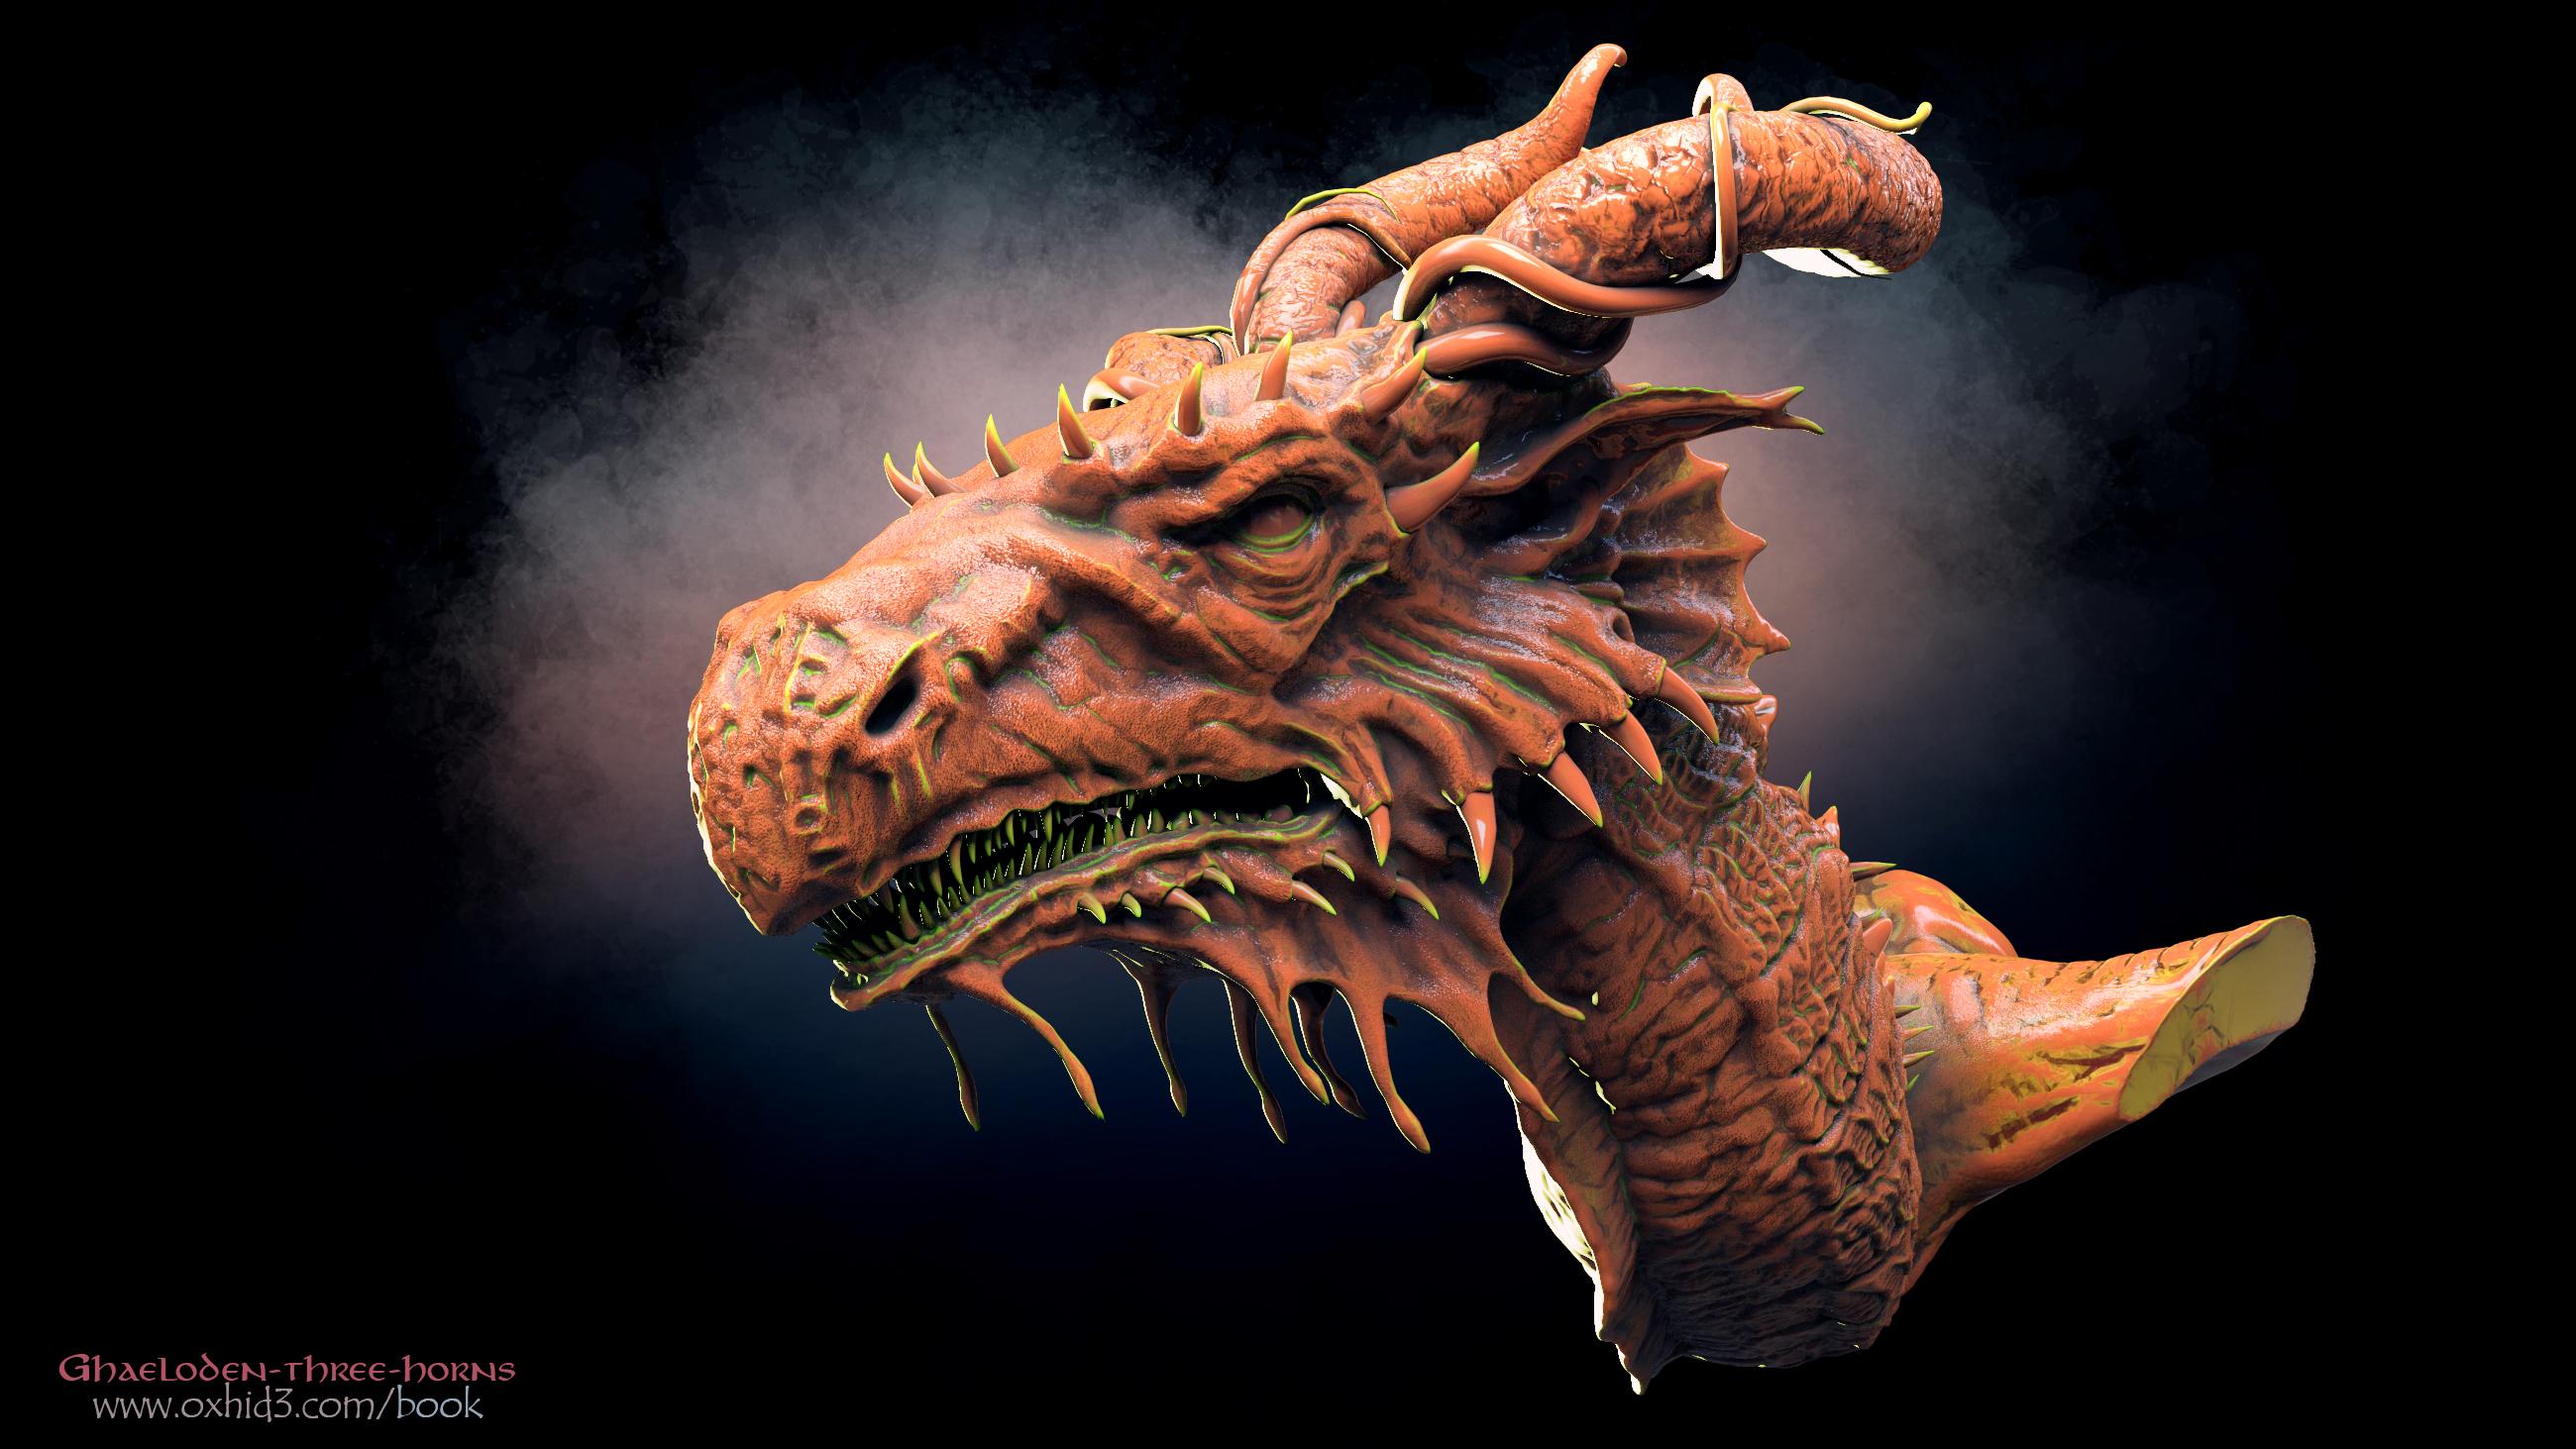 Ghaeloden-three-horns, the dragon